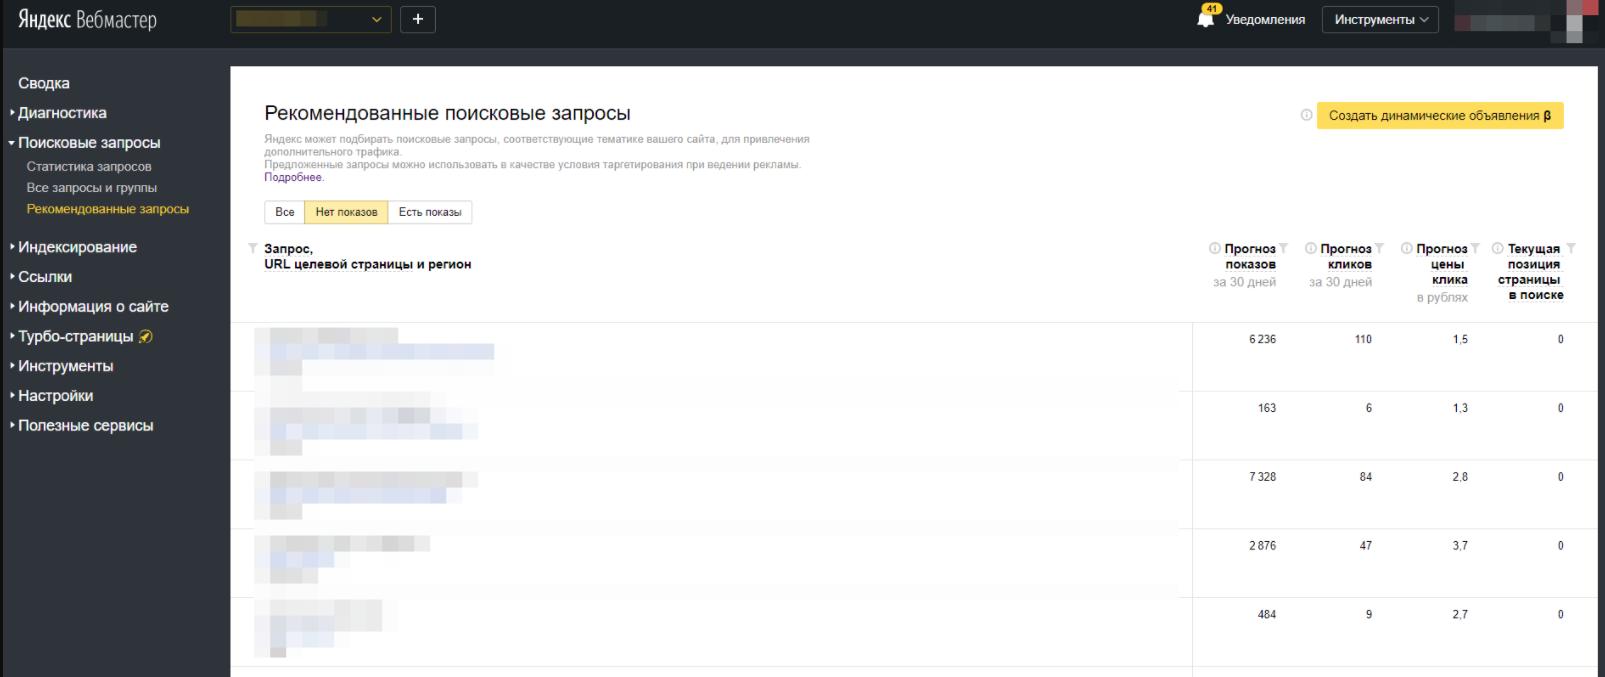 Яндекс обновил алгоритм подбора рекомендованных запросов